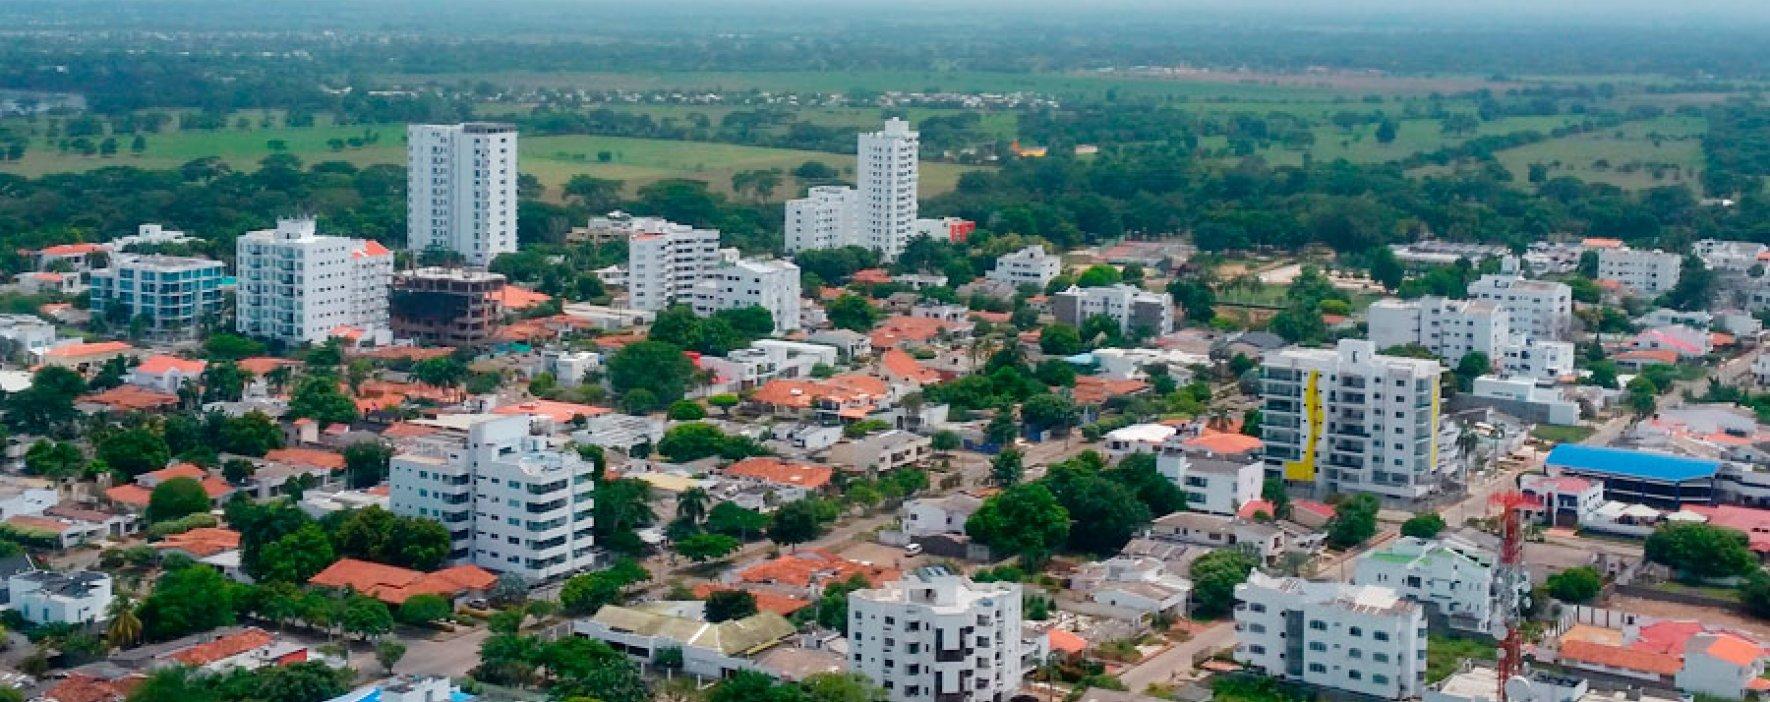 Córdoba, panorama positivo para el mercado inmobiliario